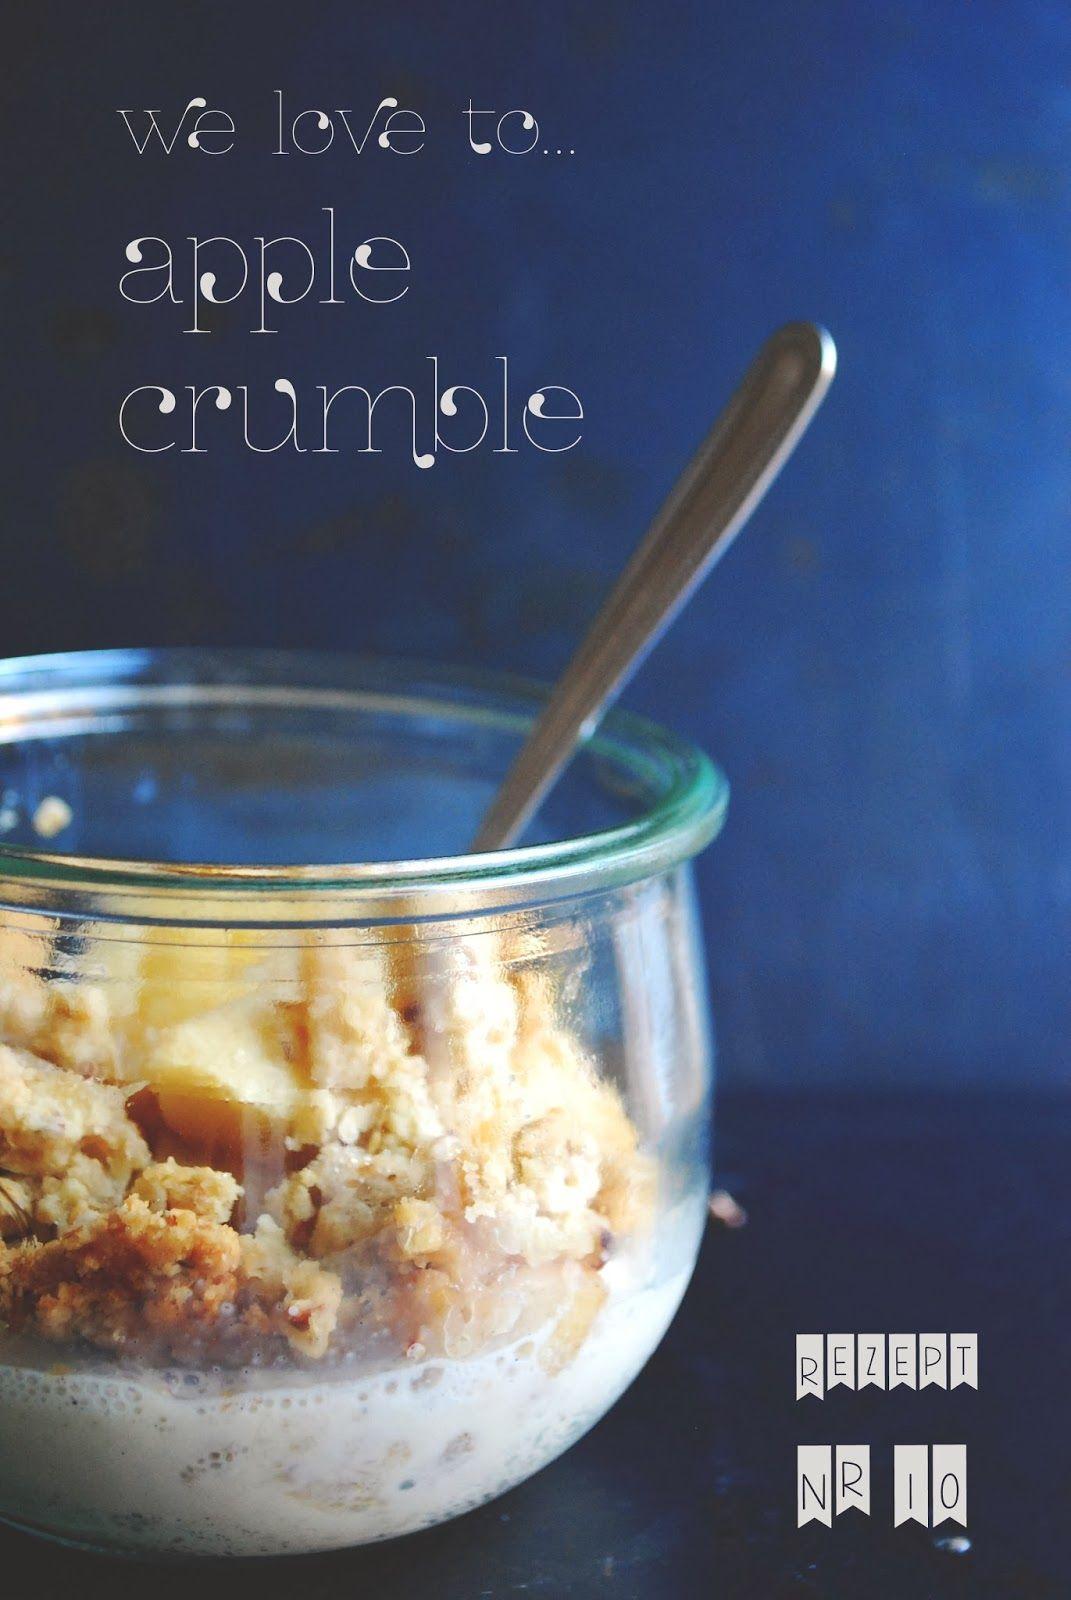 love to crumble: apple crumble